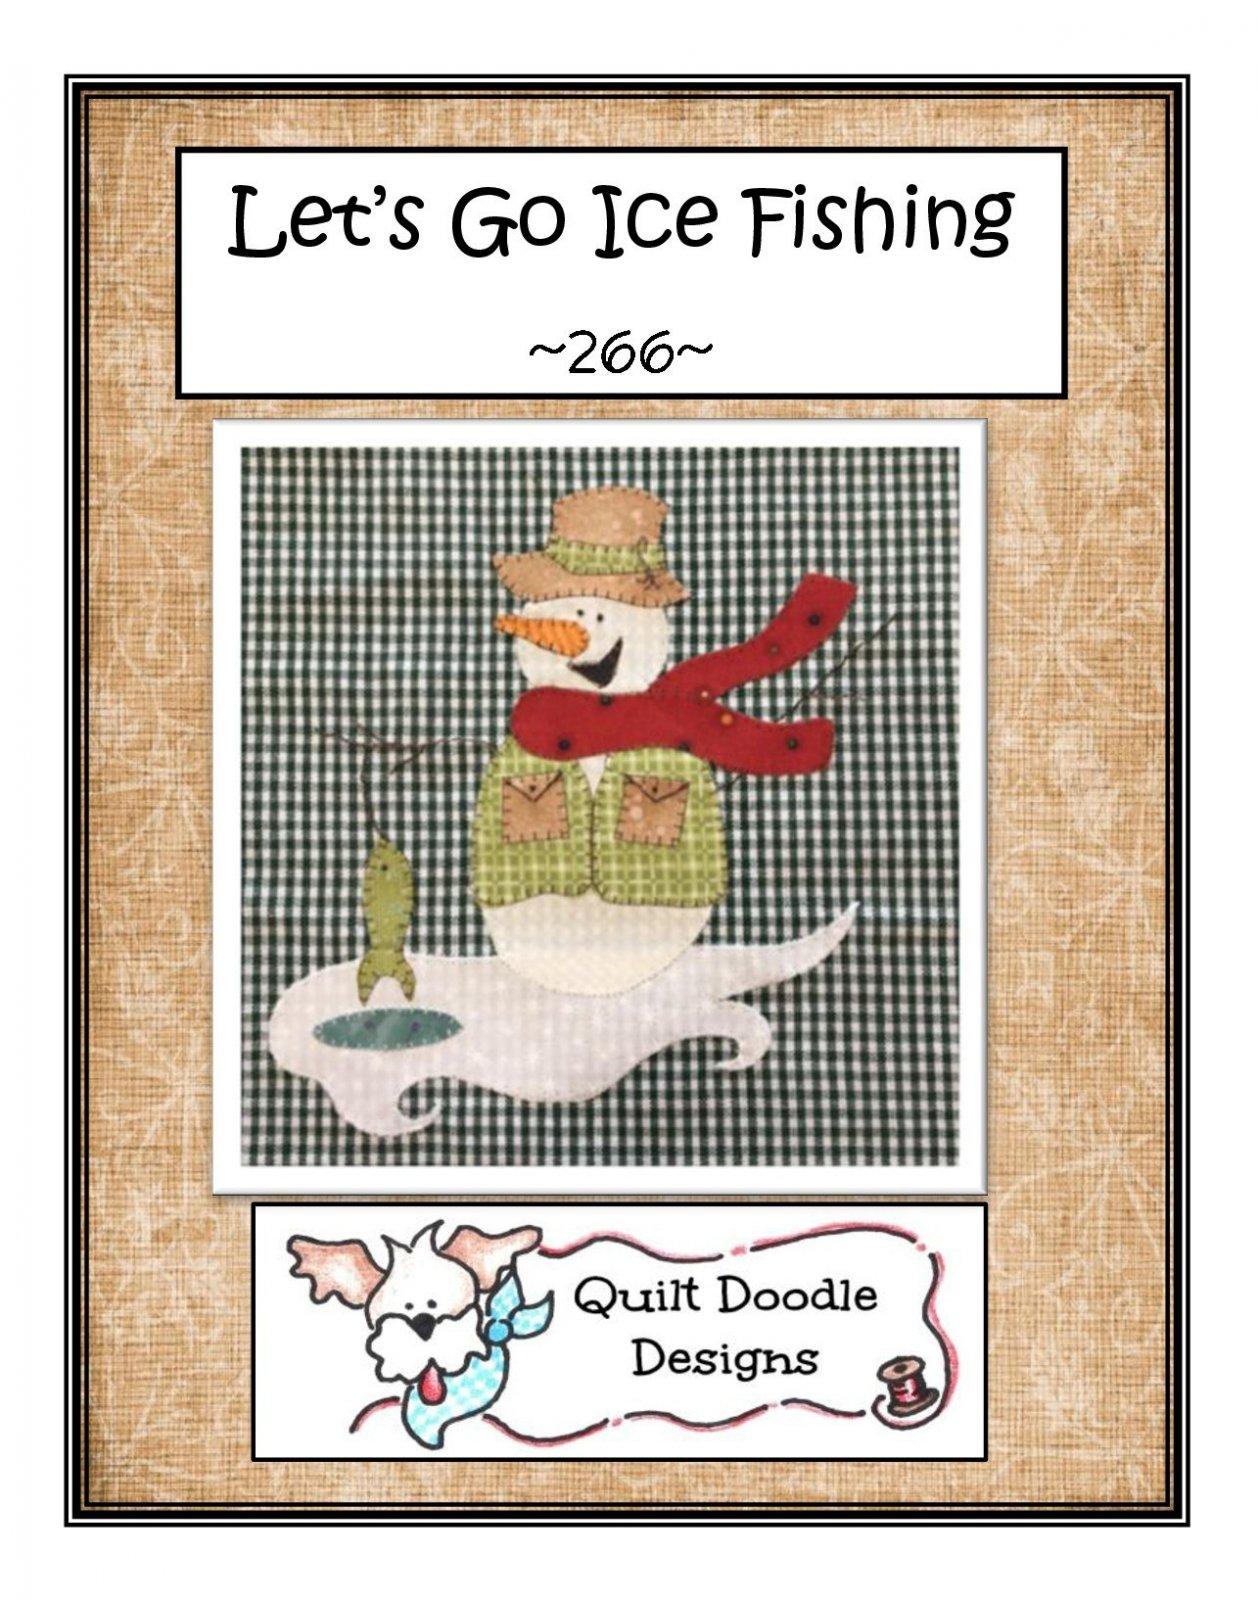 Let's Go Ice Fishing